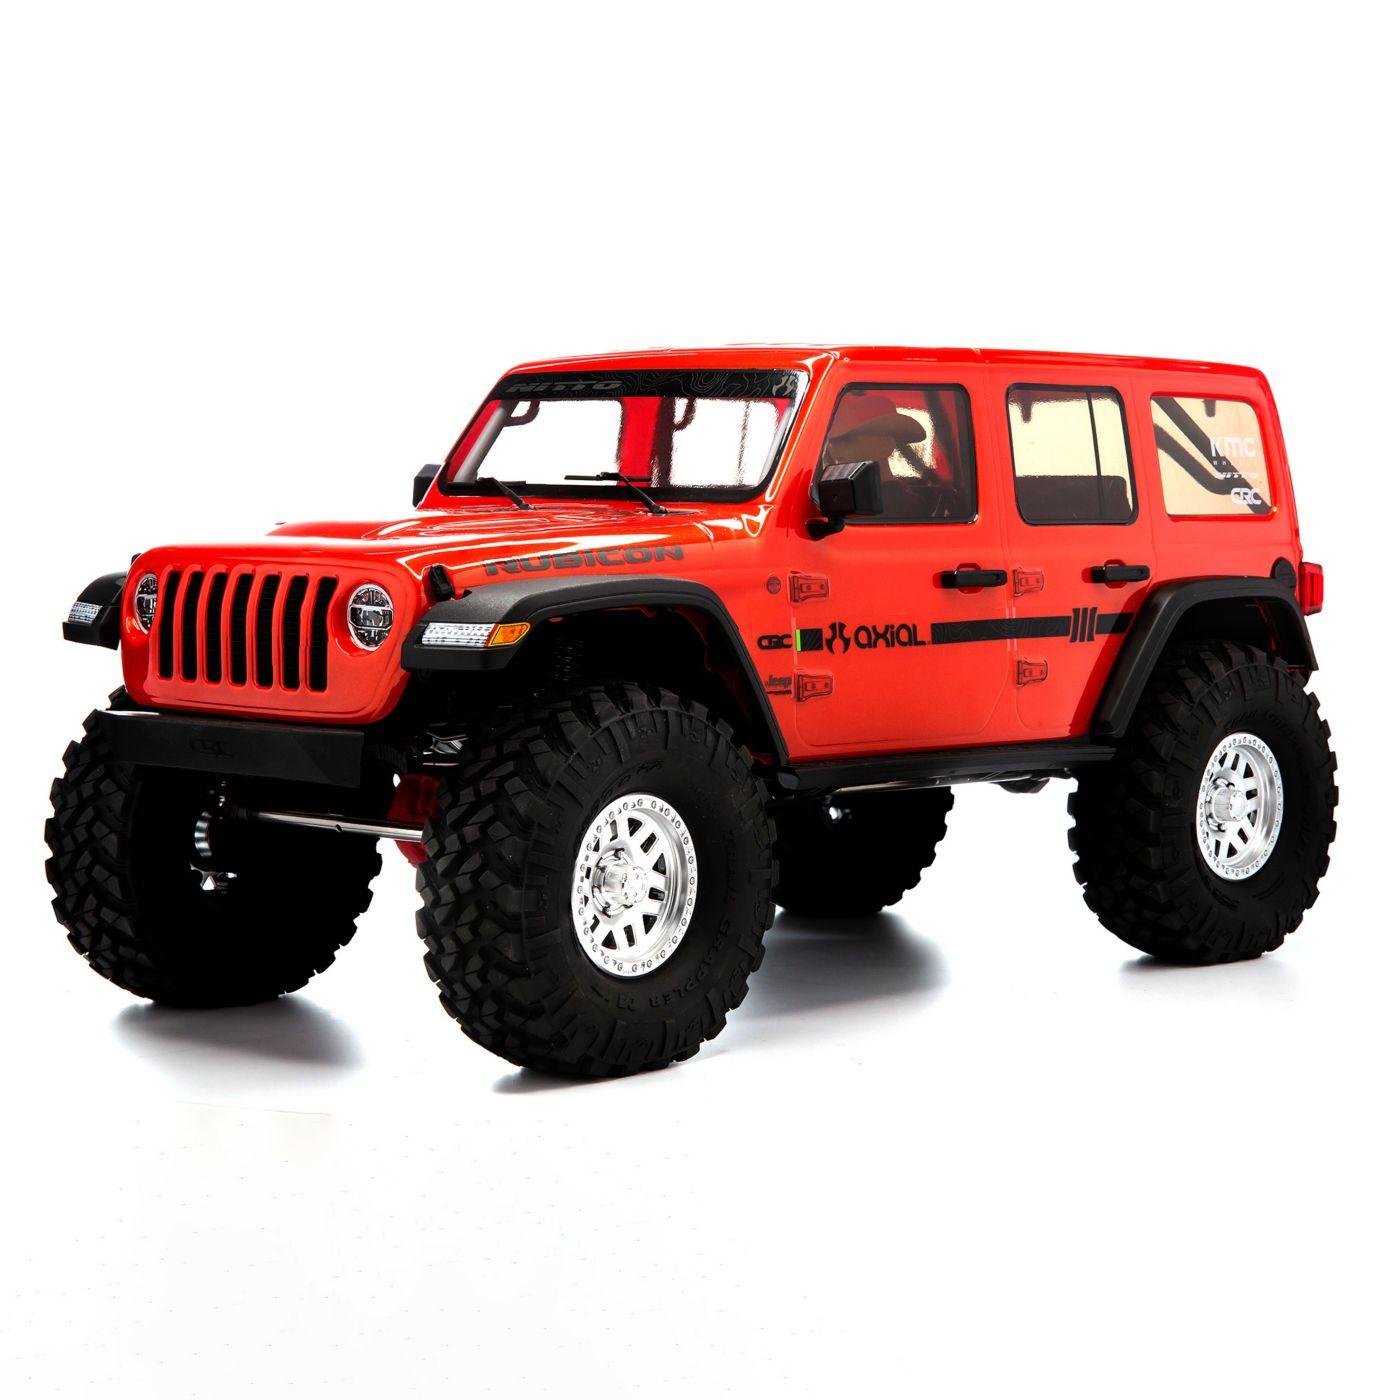 Axial SCX10 III Jeep Wrangler JLU RTR